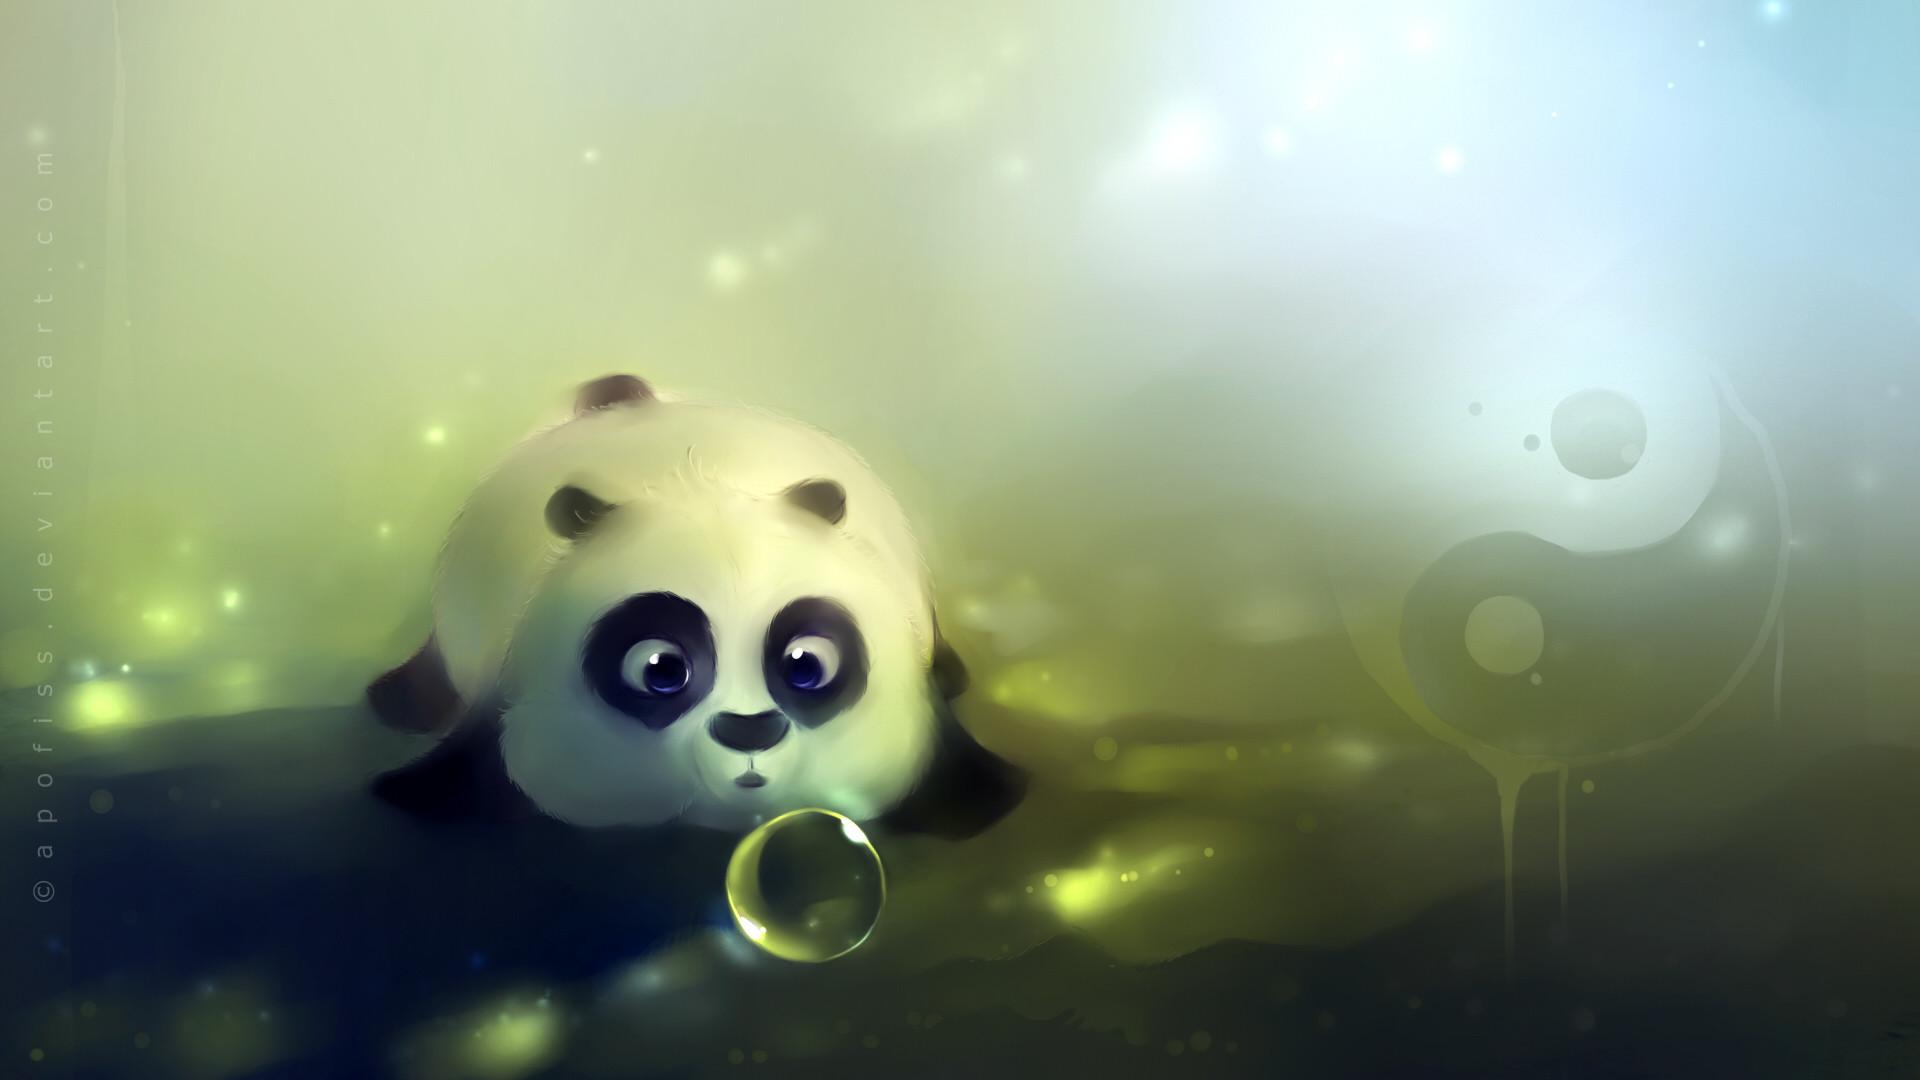 Cute Baby Panda Bear Wallpaper High Definition Iphone In Snow Cute 1280×800  Cute Baby